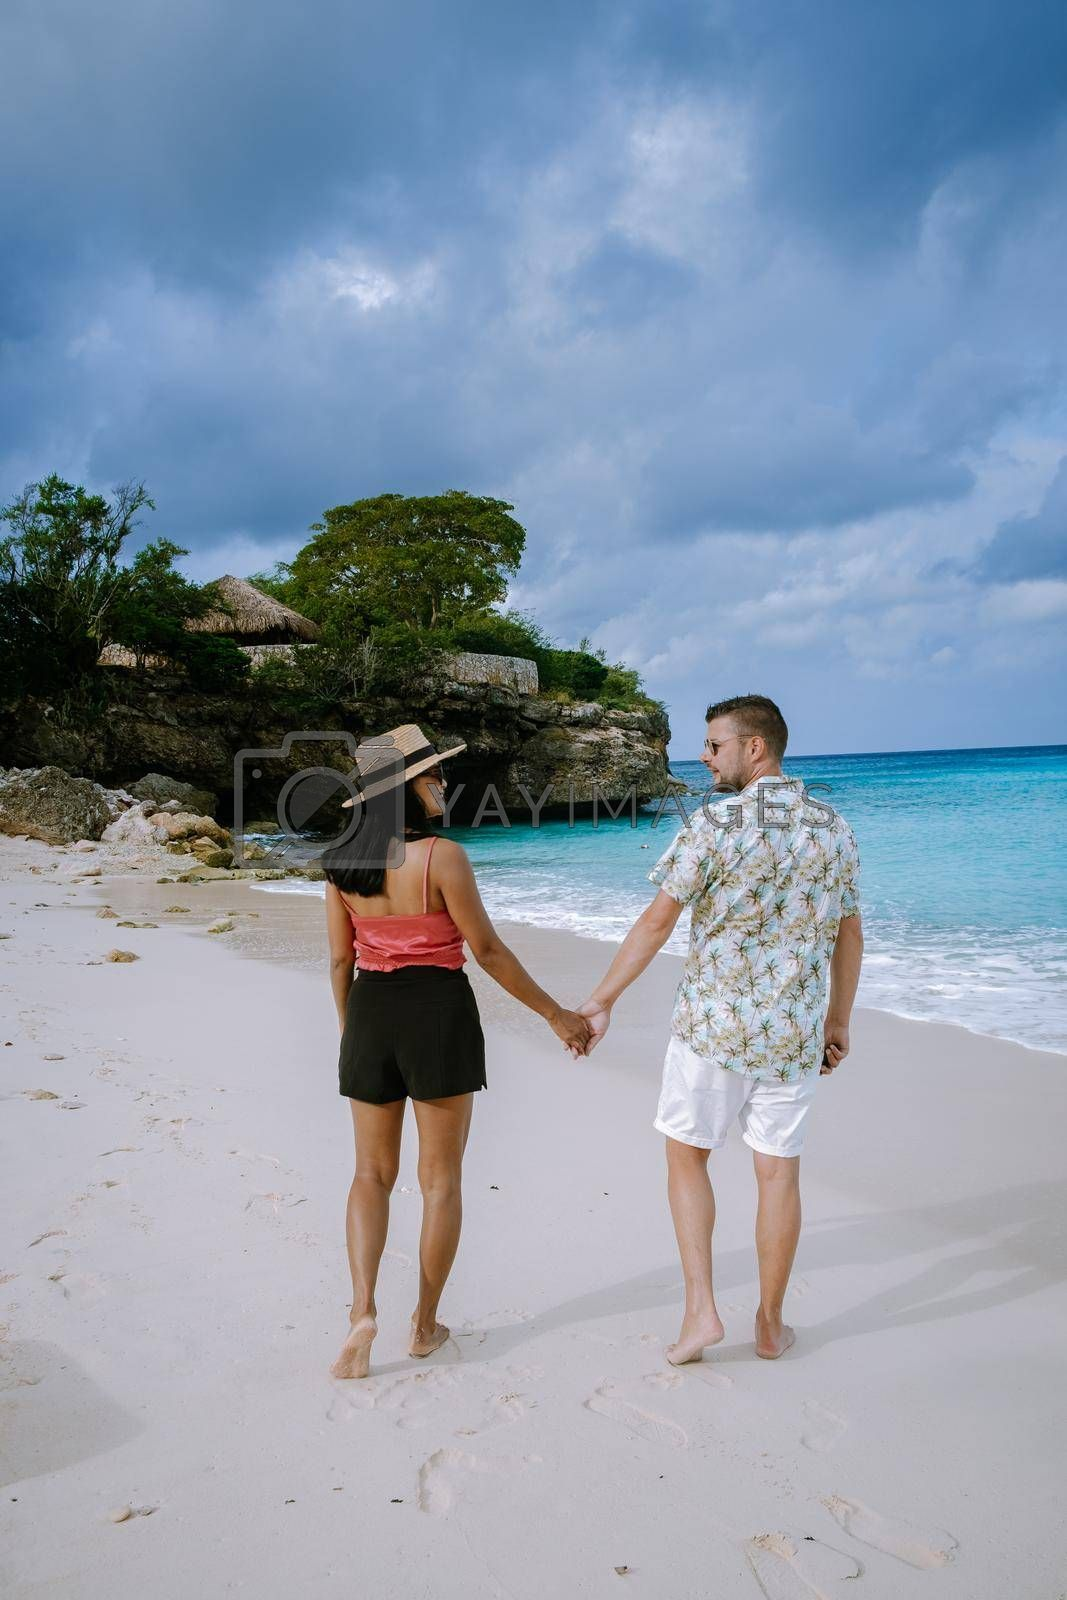 Grote knip beach Curacao, Island beach of Curacao in the Caribbean men and woman on vacation visit the beach. couple mid age men and woman on the beach Playa Knip